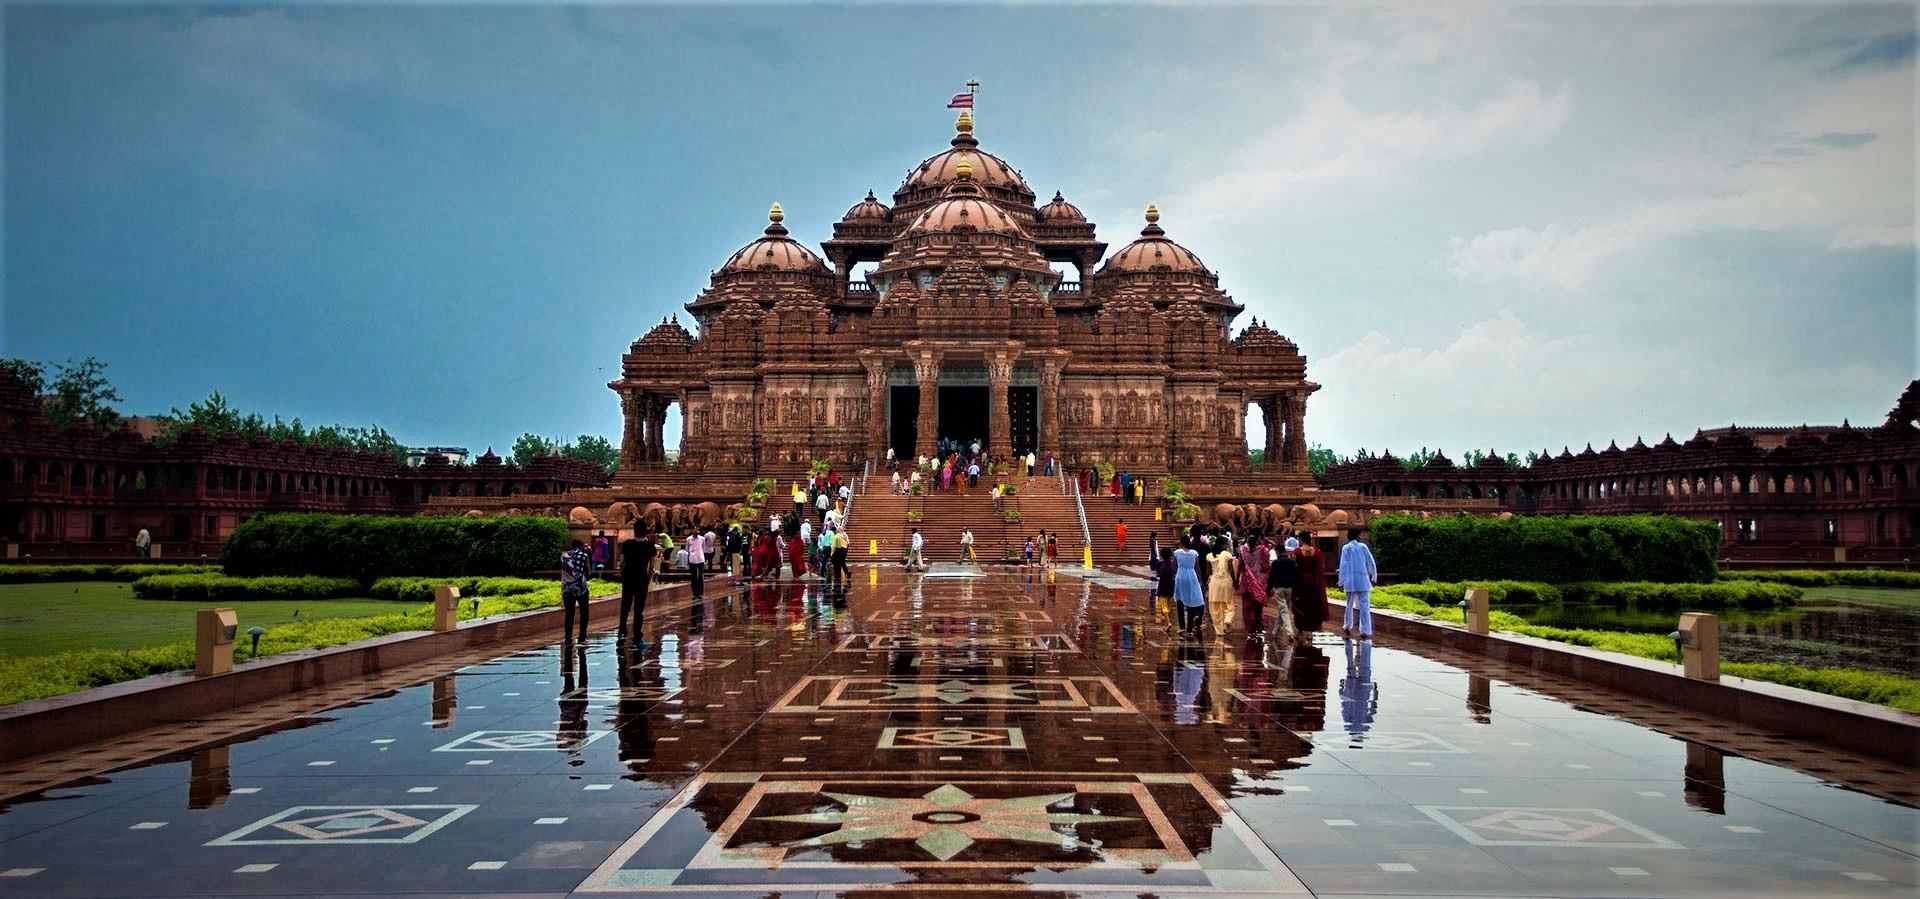 Akshardham Temple - New Delhi - India